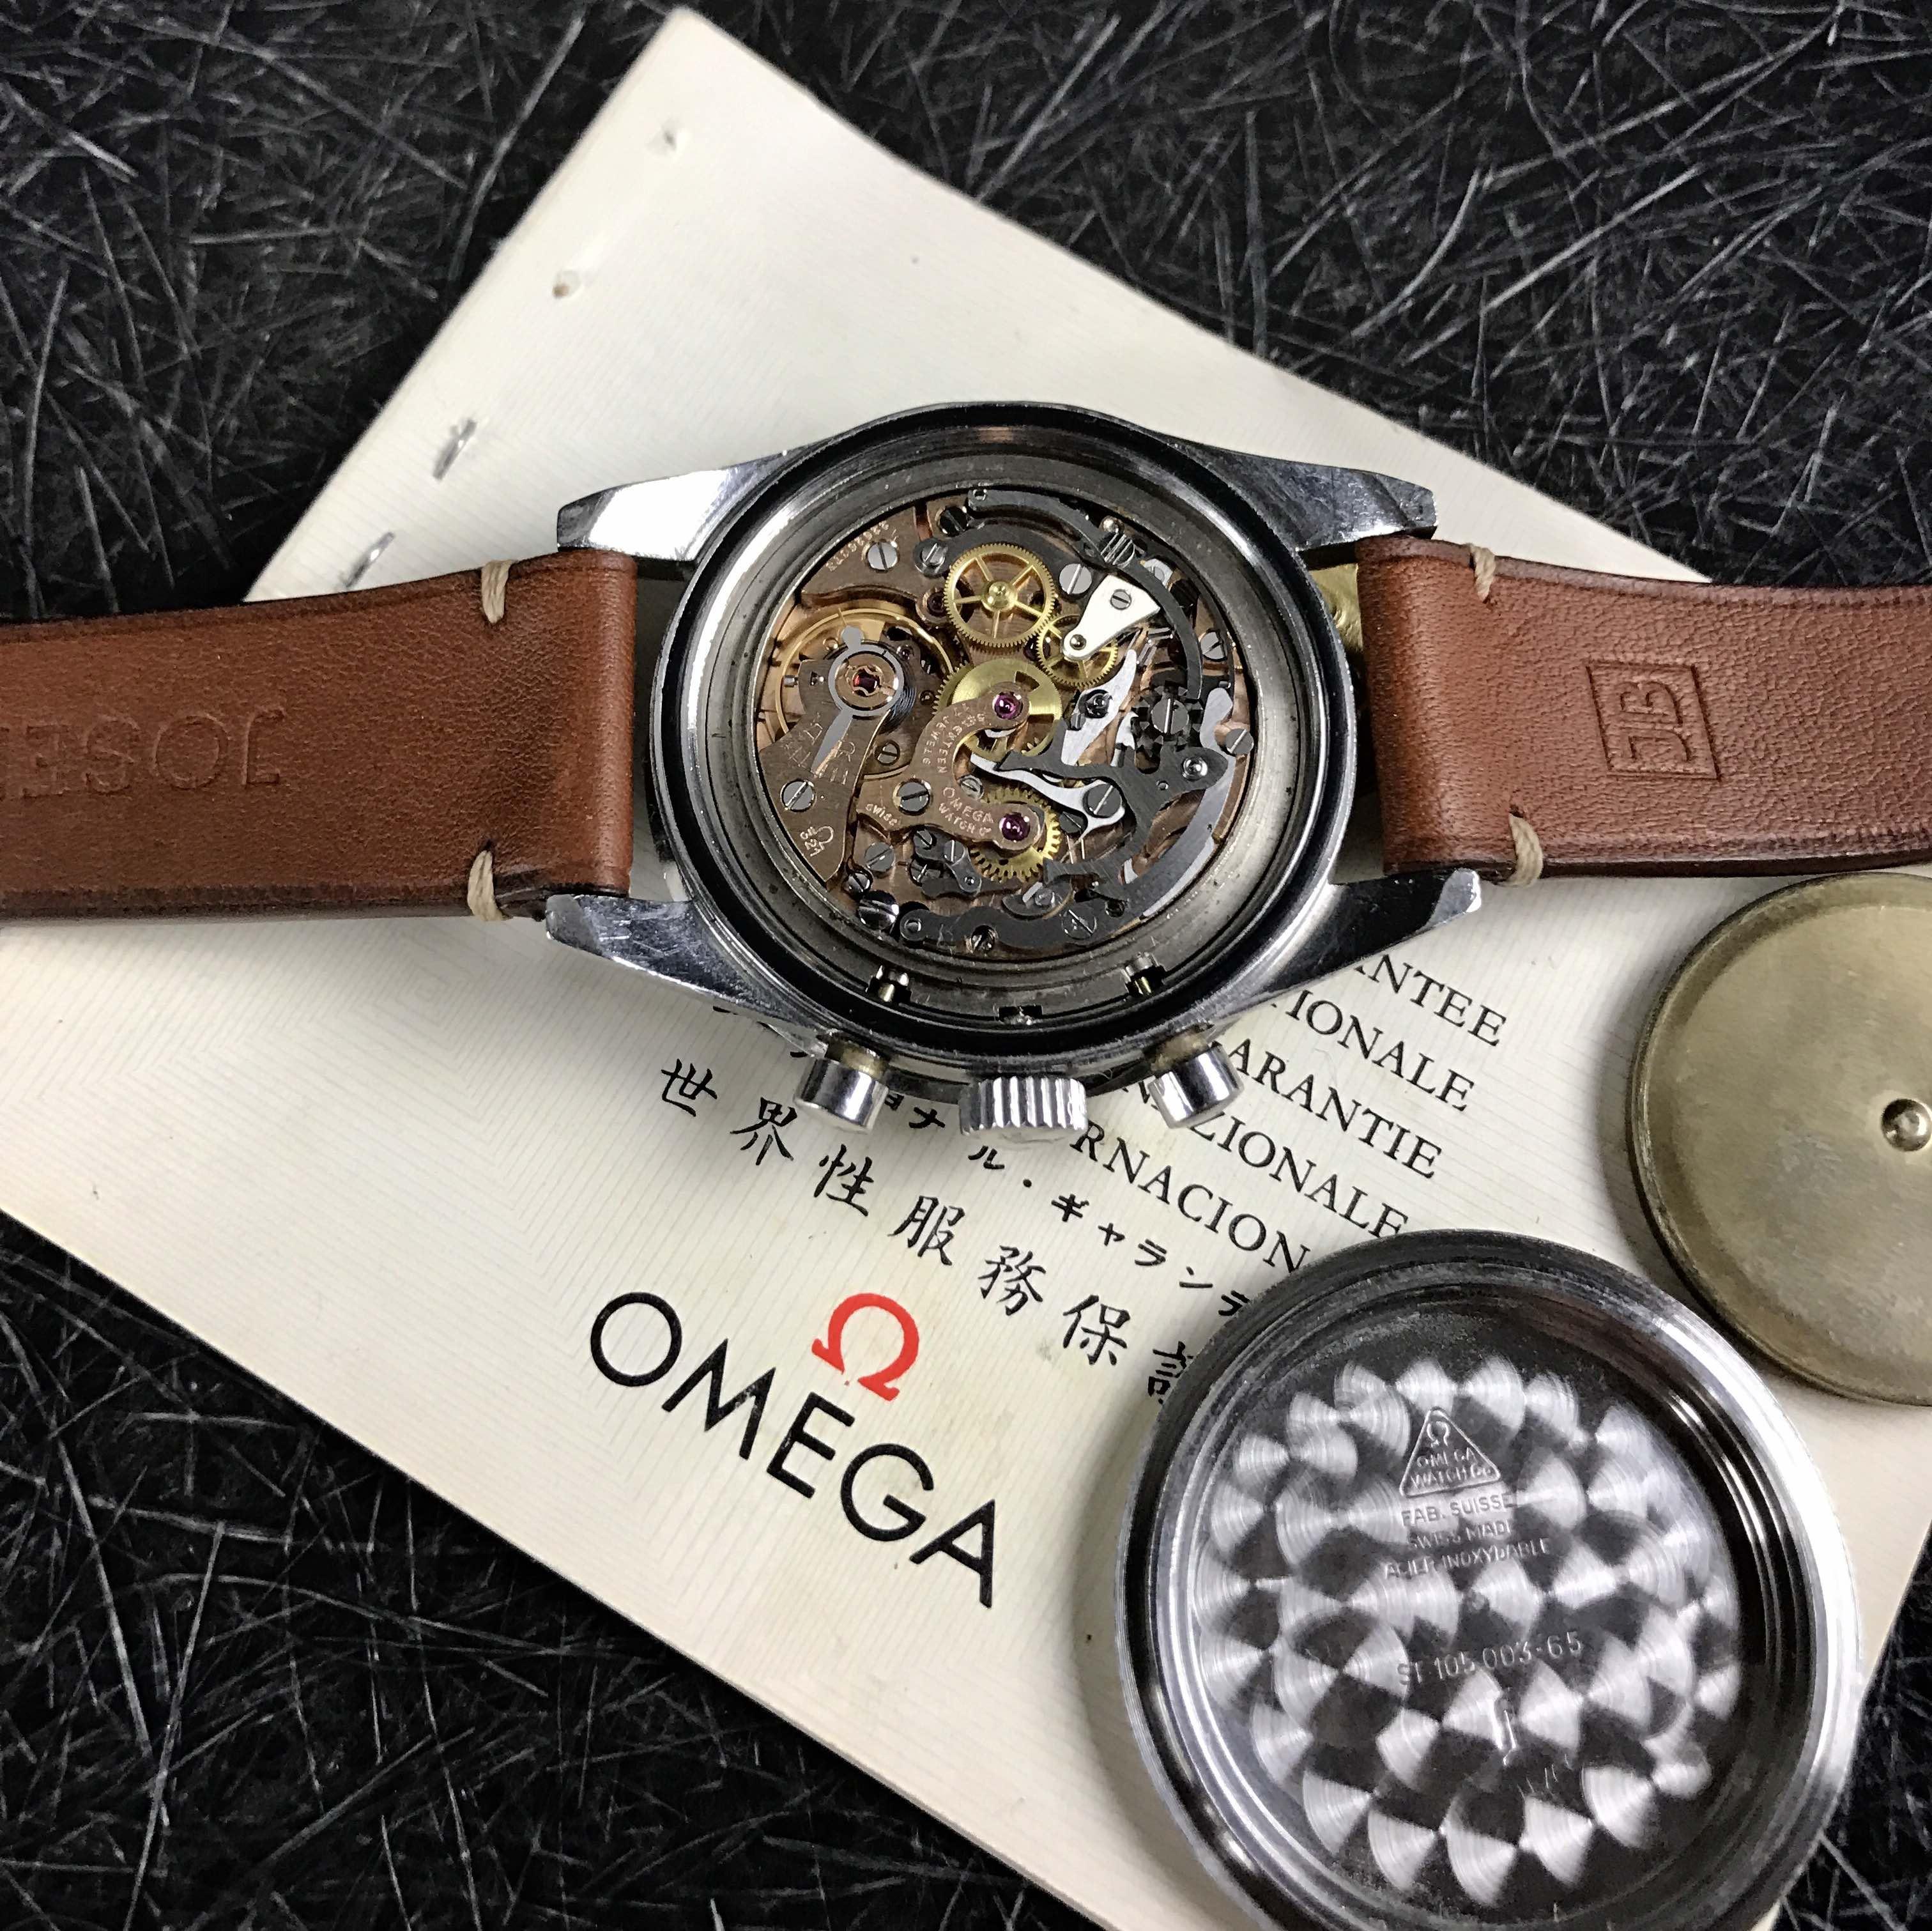 Omega Speedmaster Pre-Moon 105.003 - Calibre 321